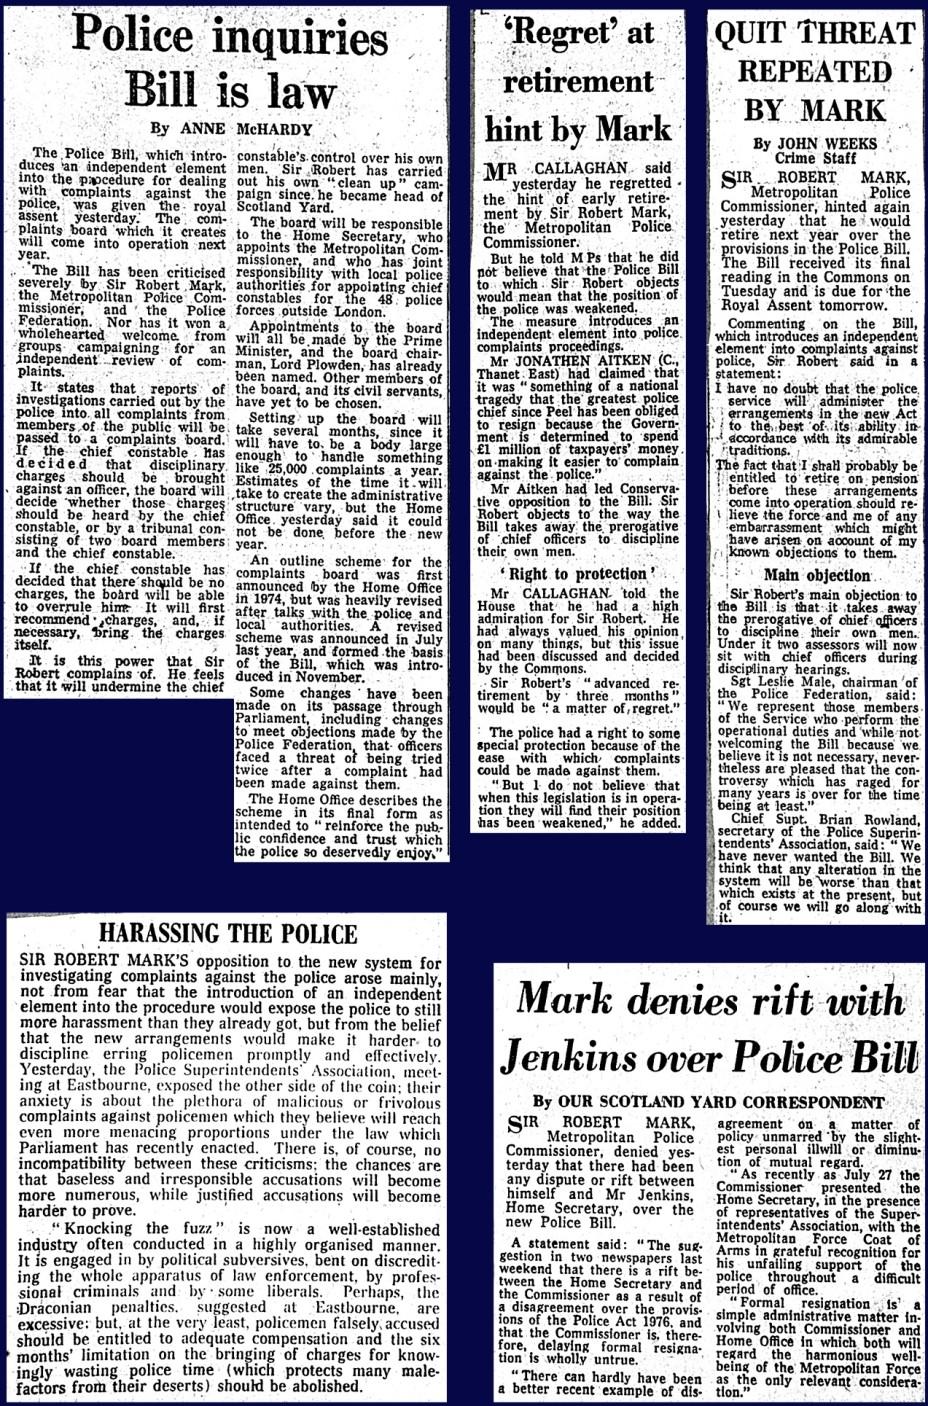 Police Enquiries Bill